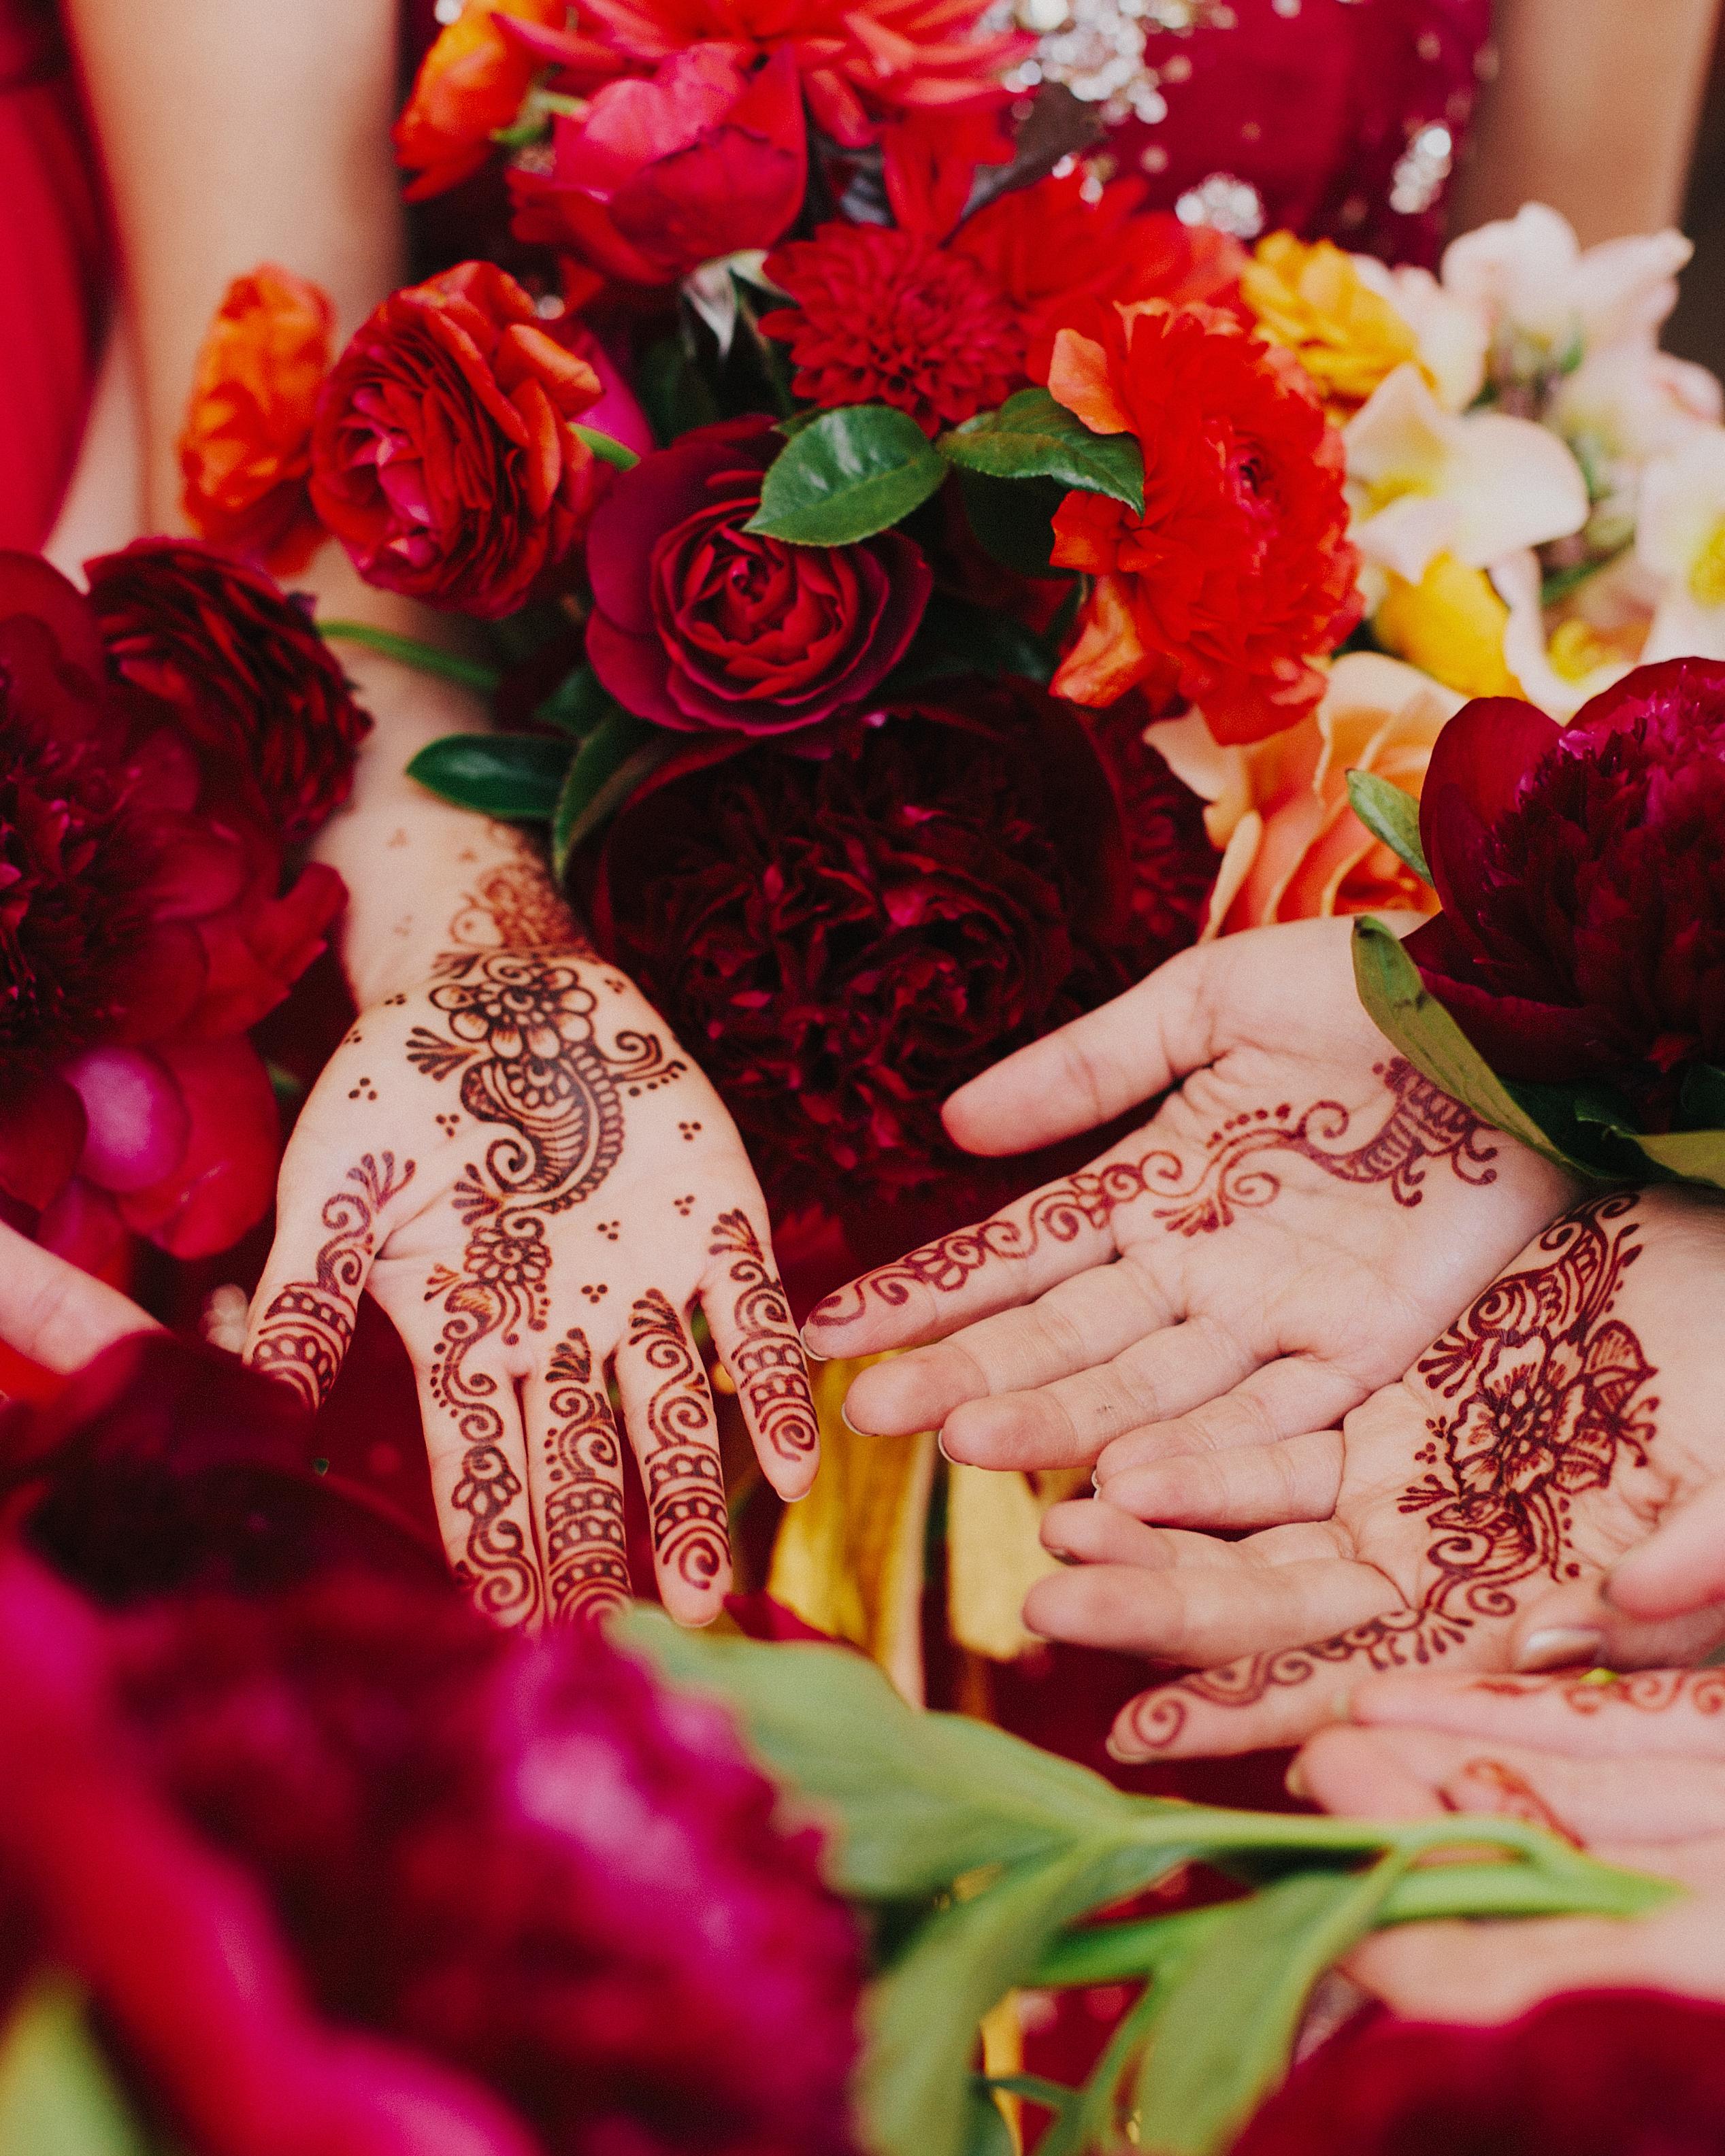 prem-judy-wedding-148-s111100.jpg